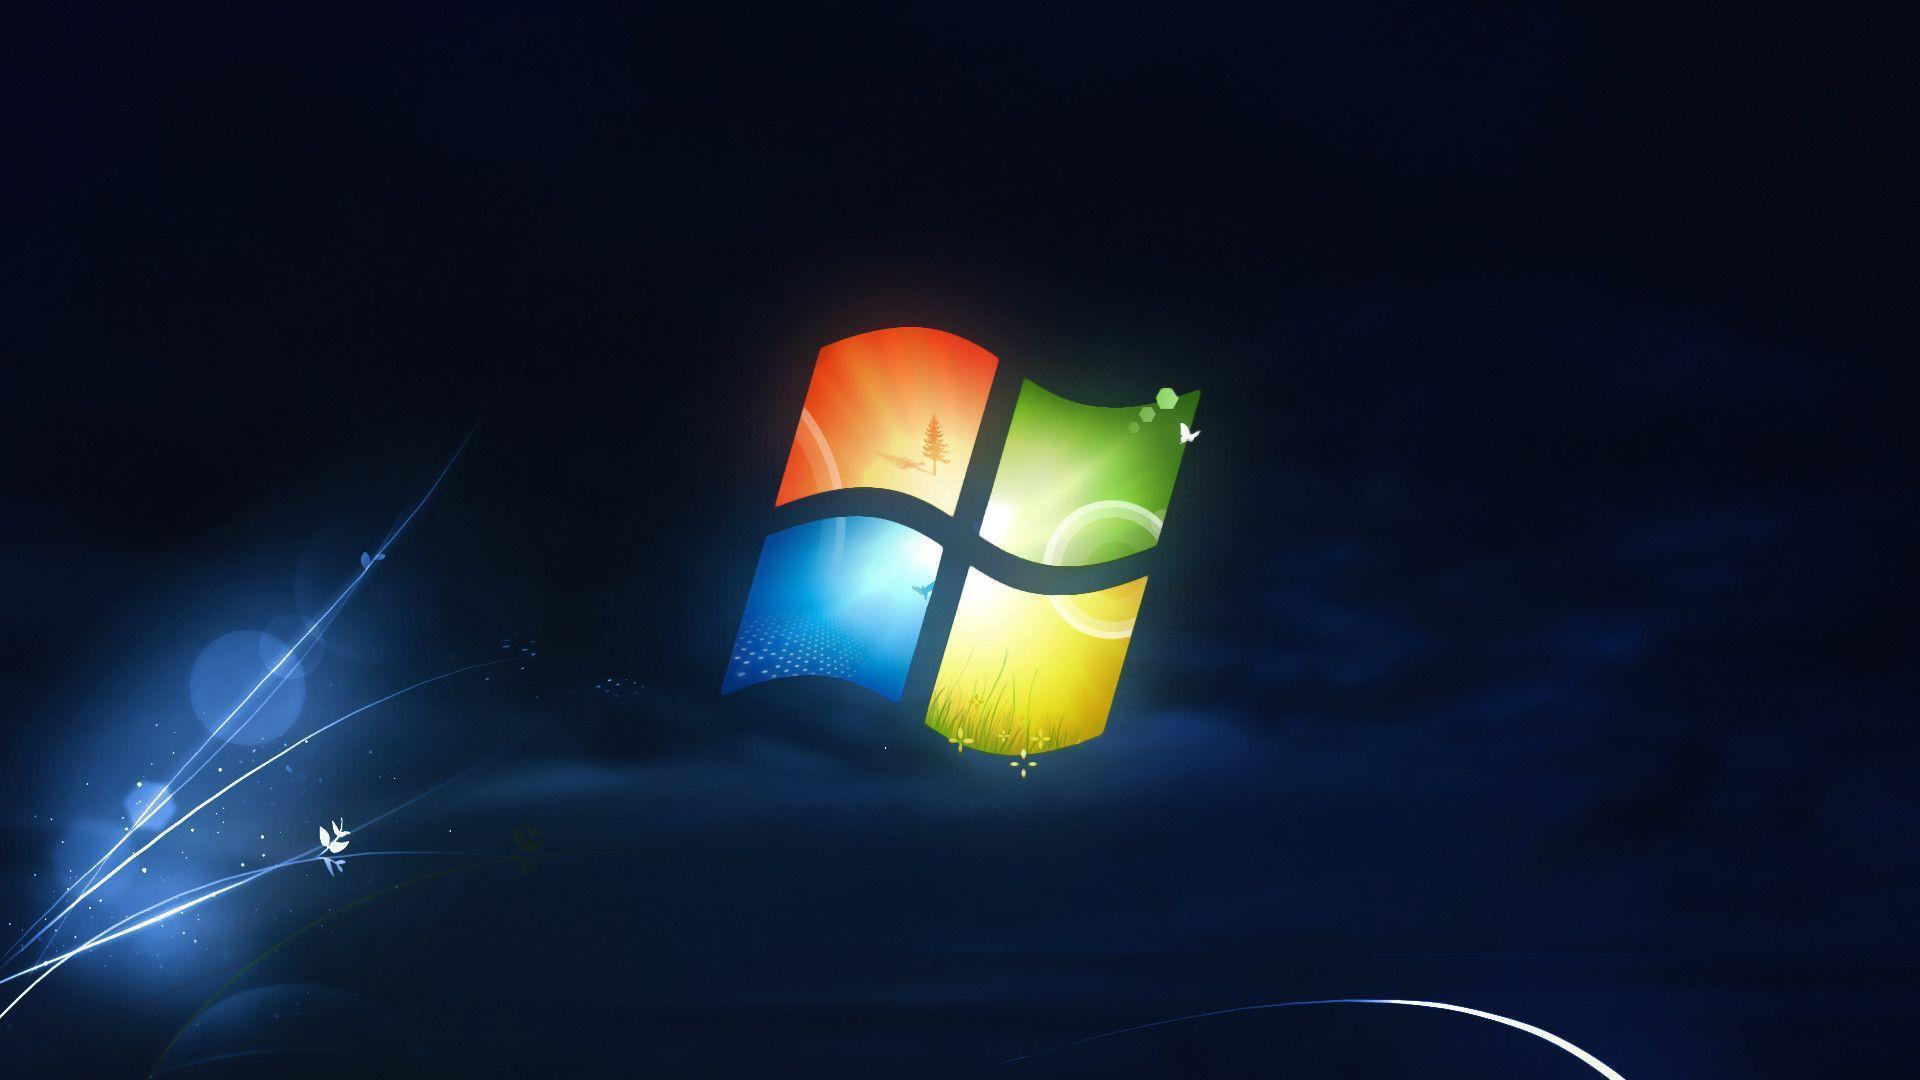 Microsoft Desktop Backgrounds Free Wallpaper Cave